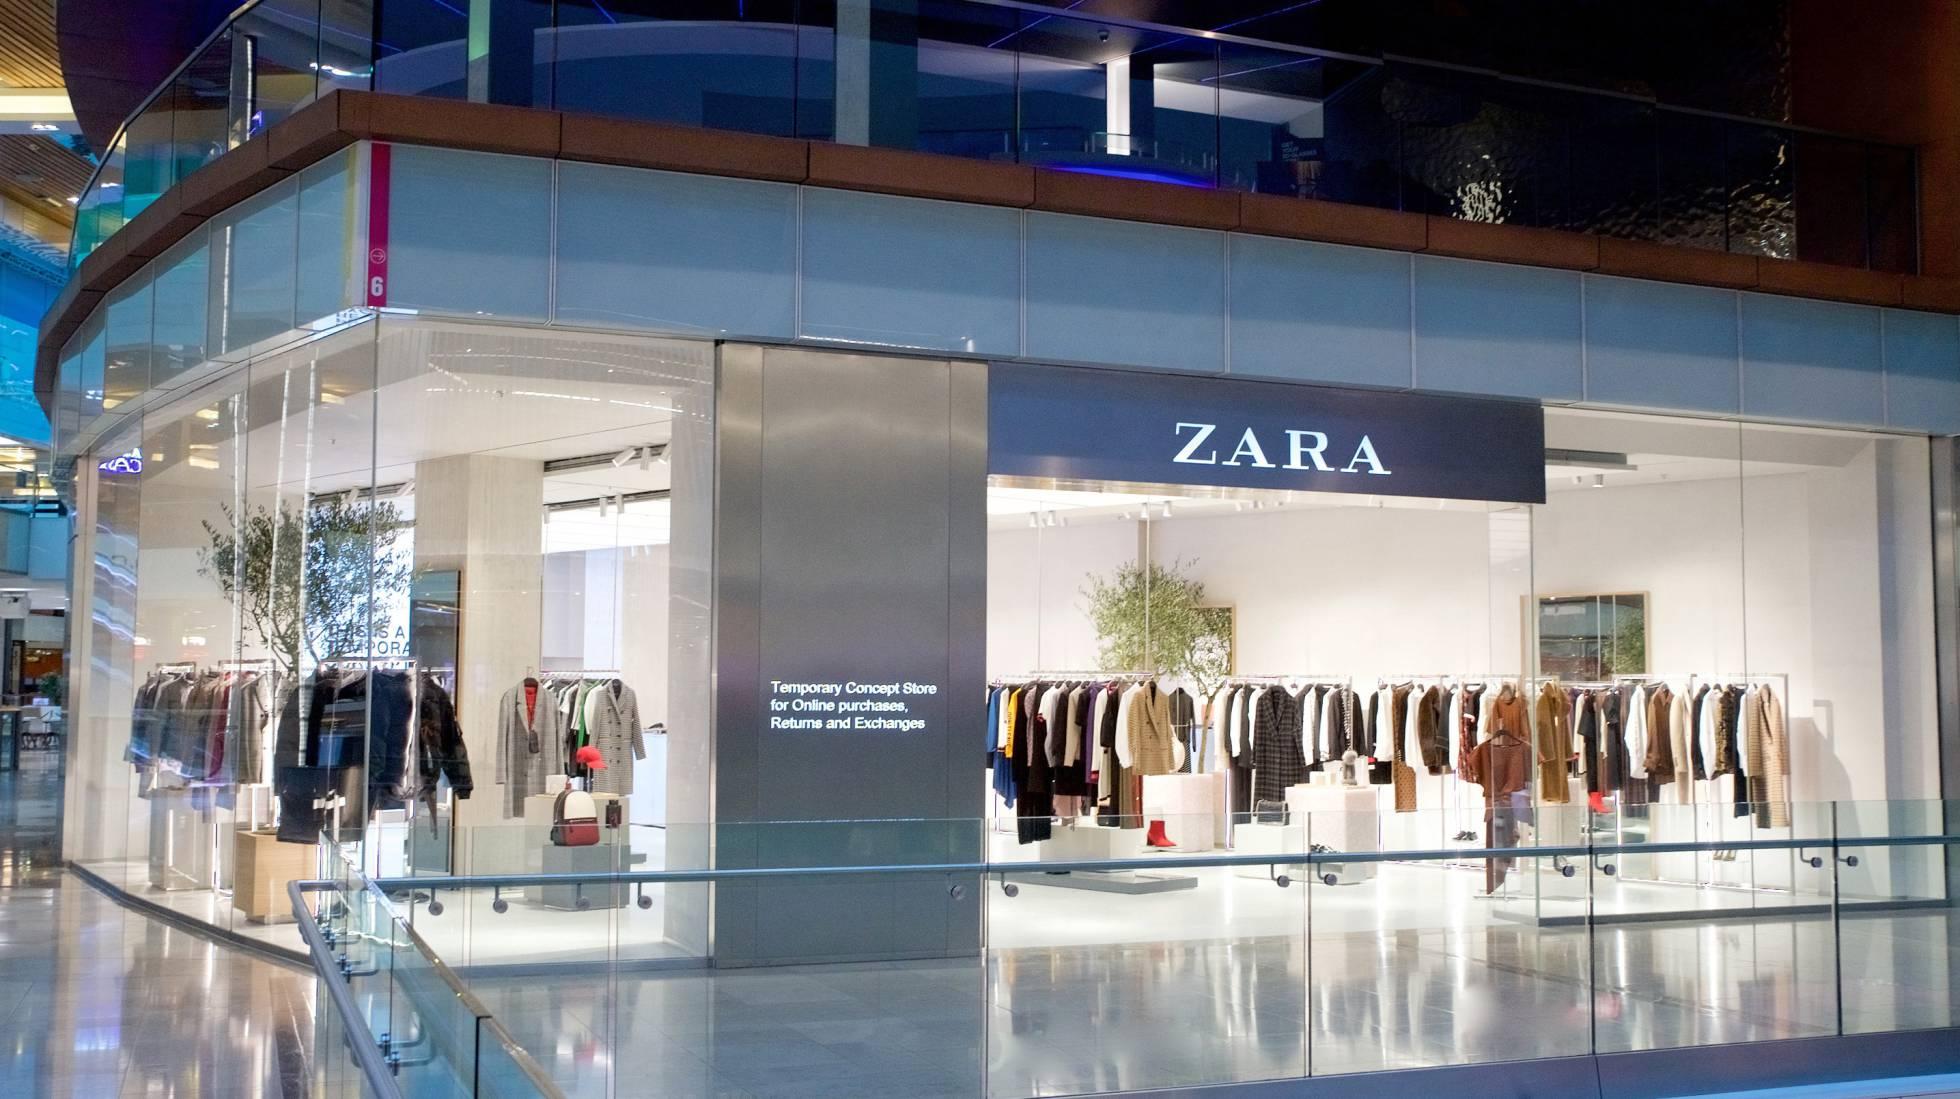 Futuro del retail, la tienda omnicanal